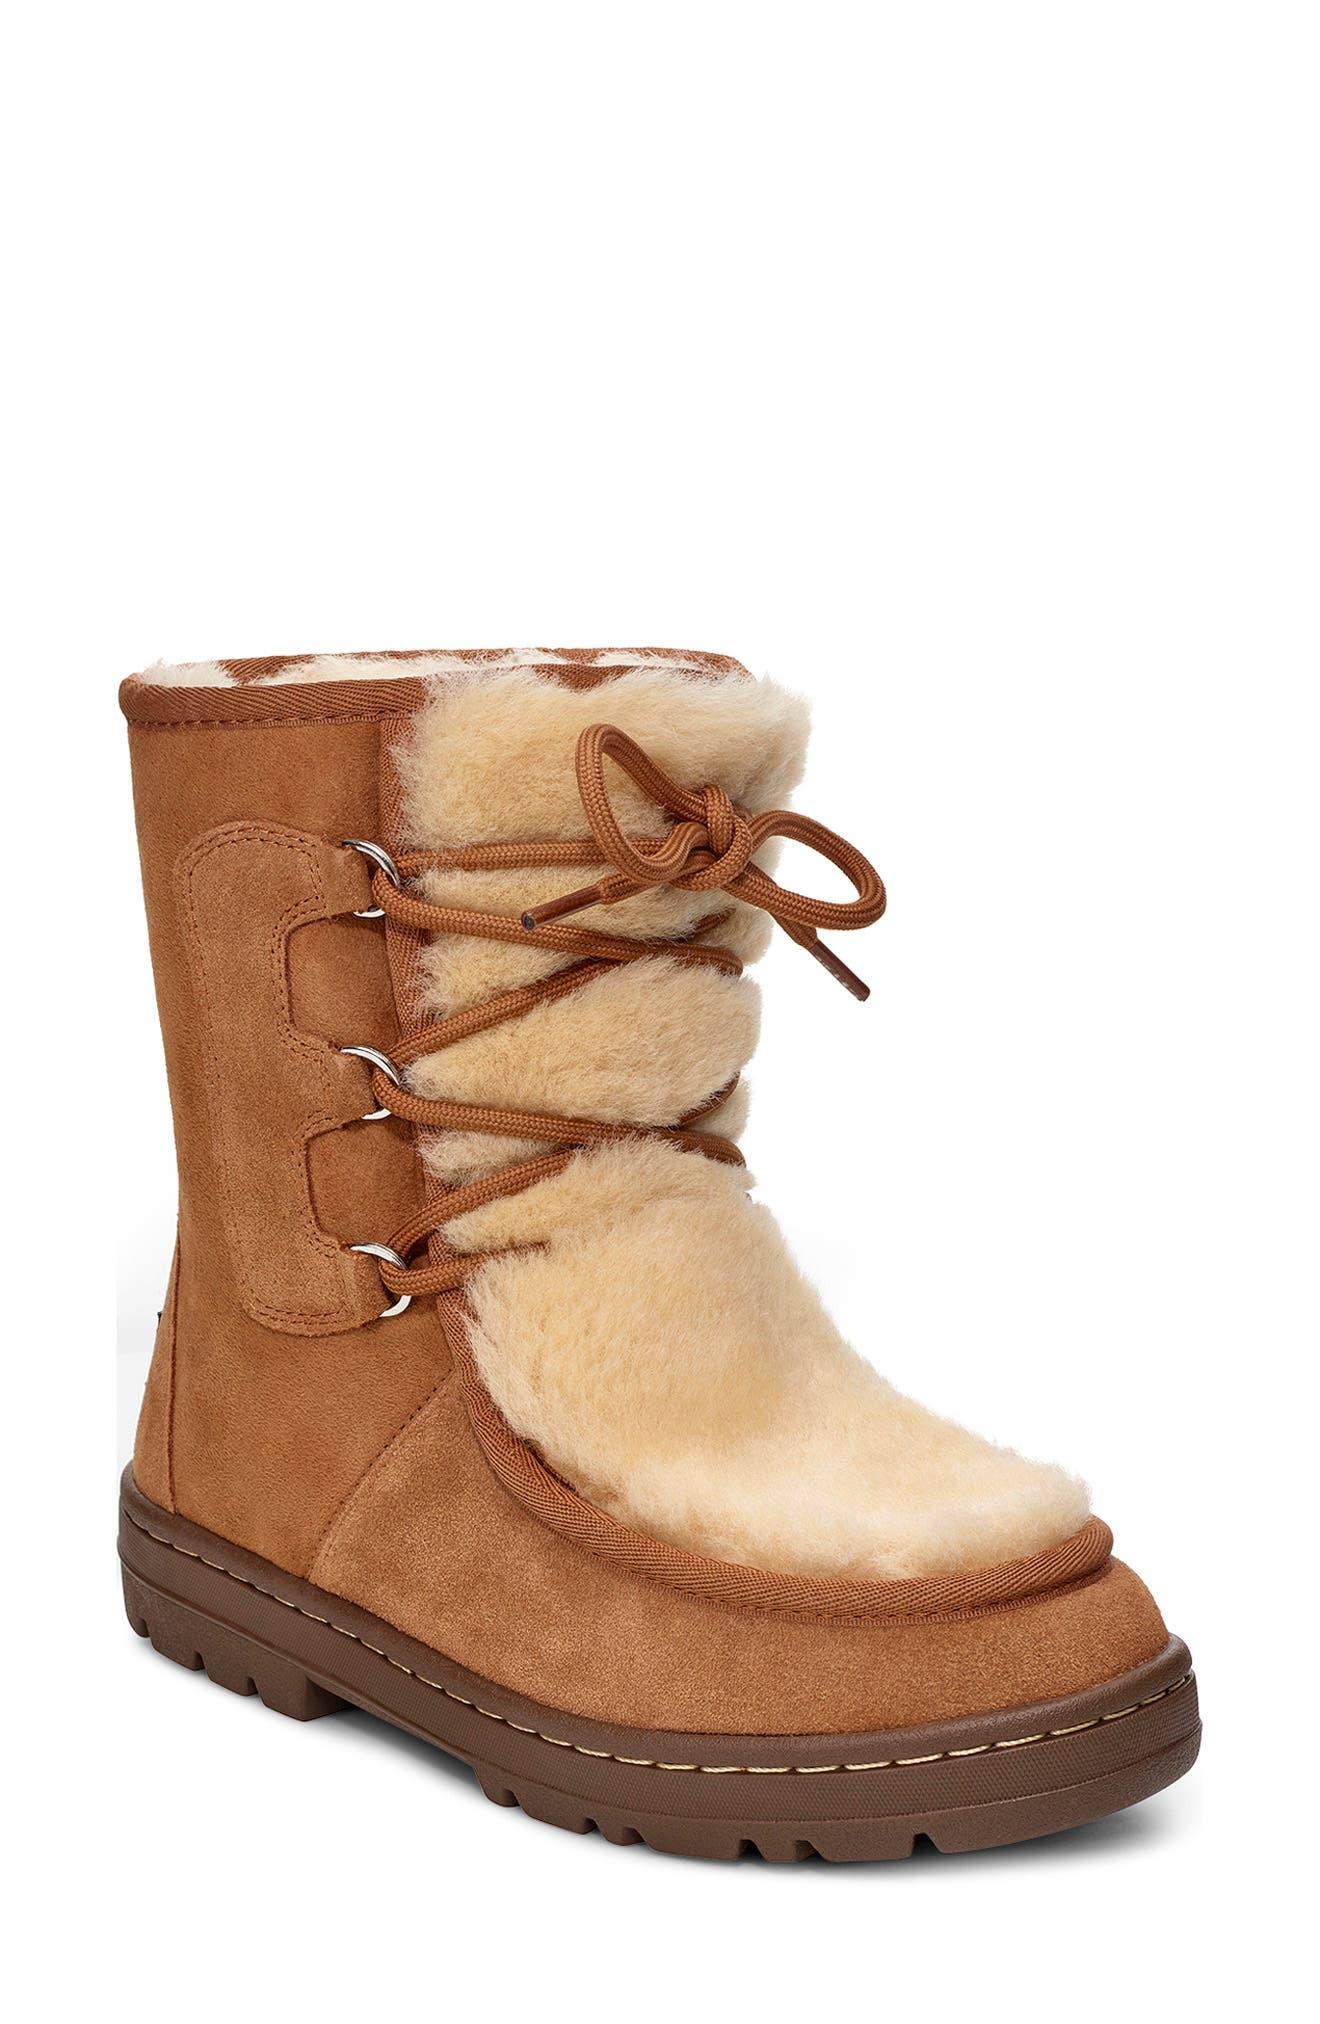 Image of UGG Mukluk Genuine Shearling Trimmed Revival Boot